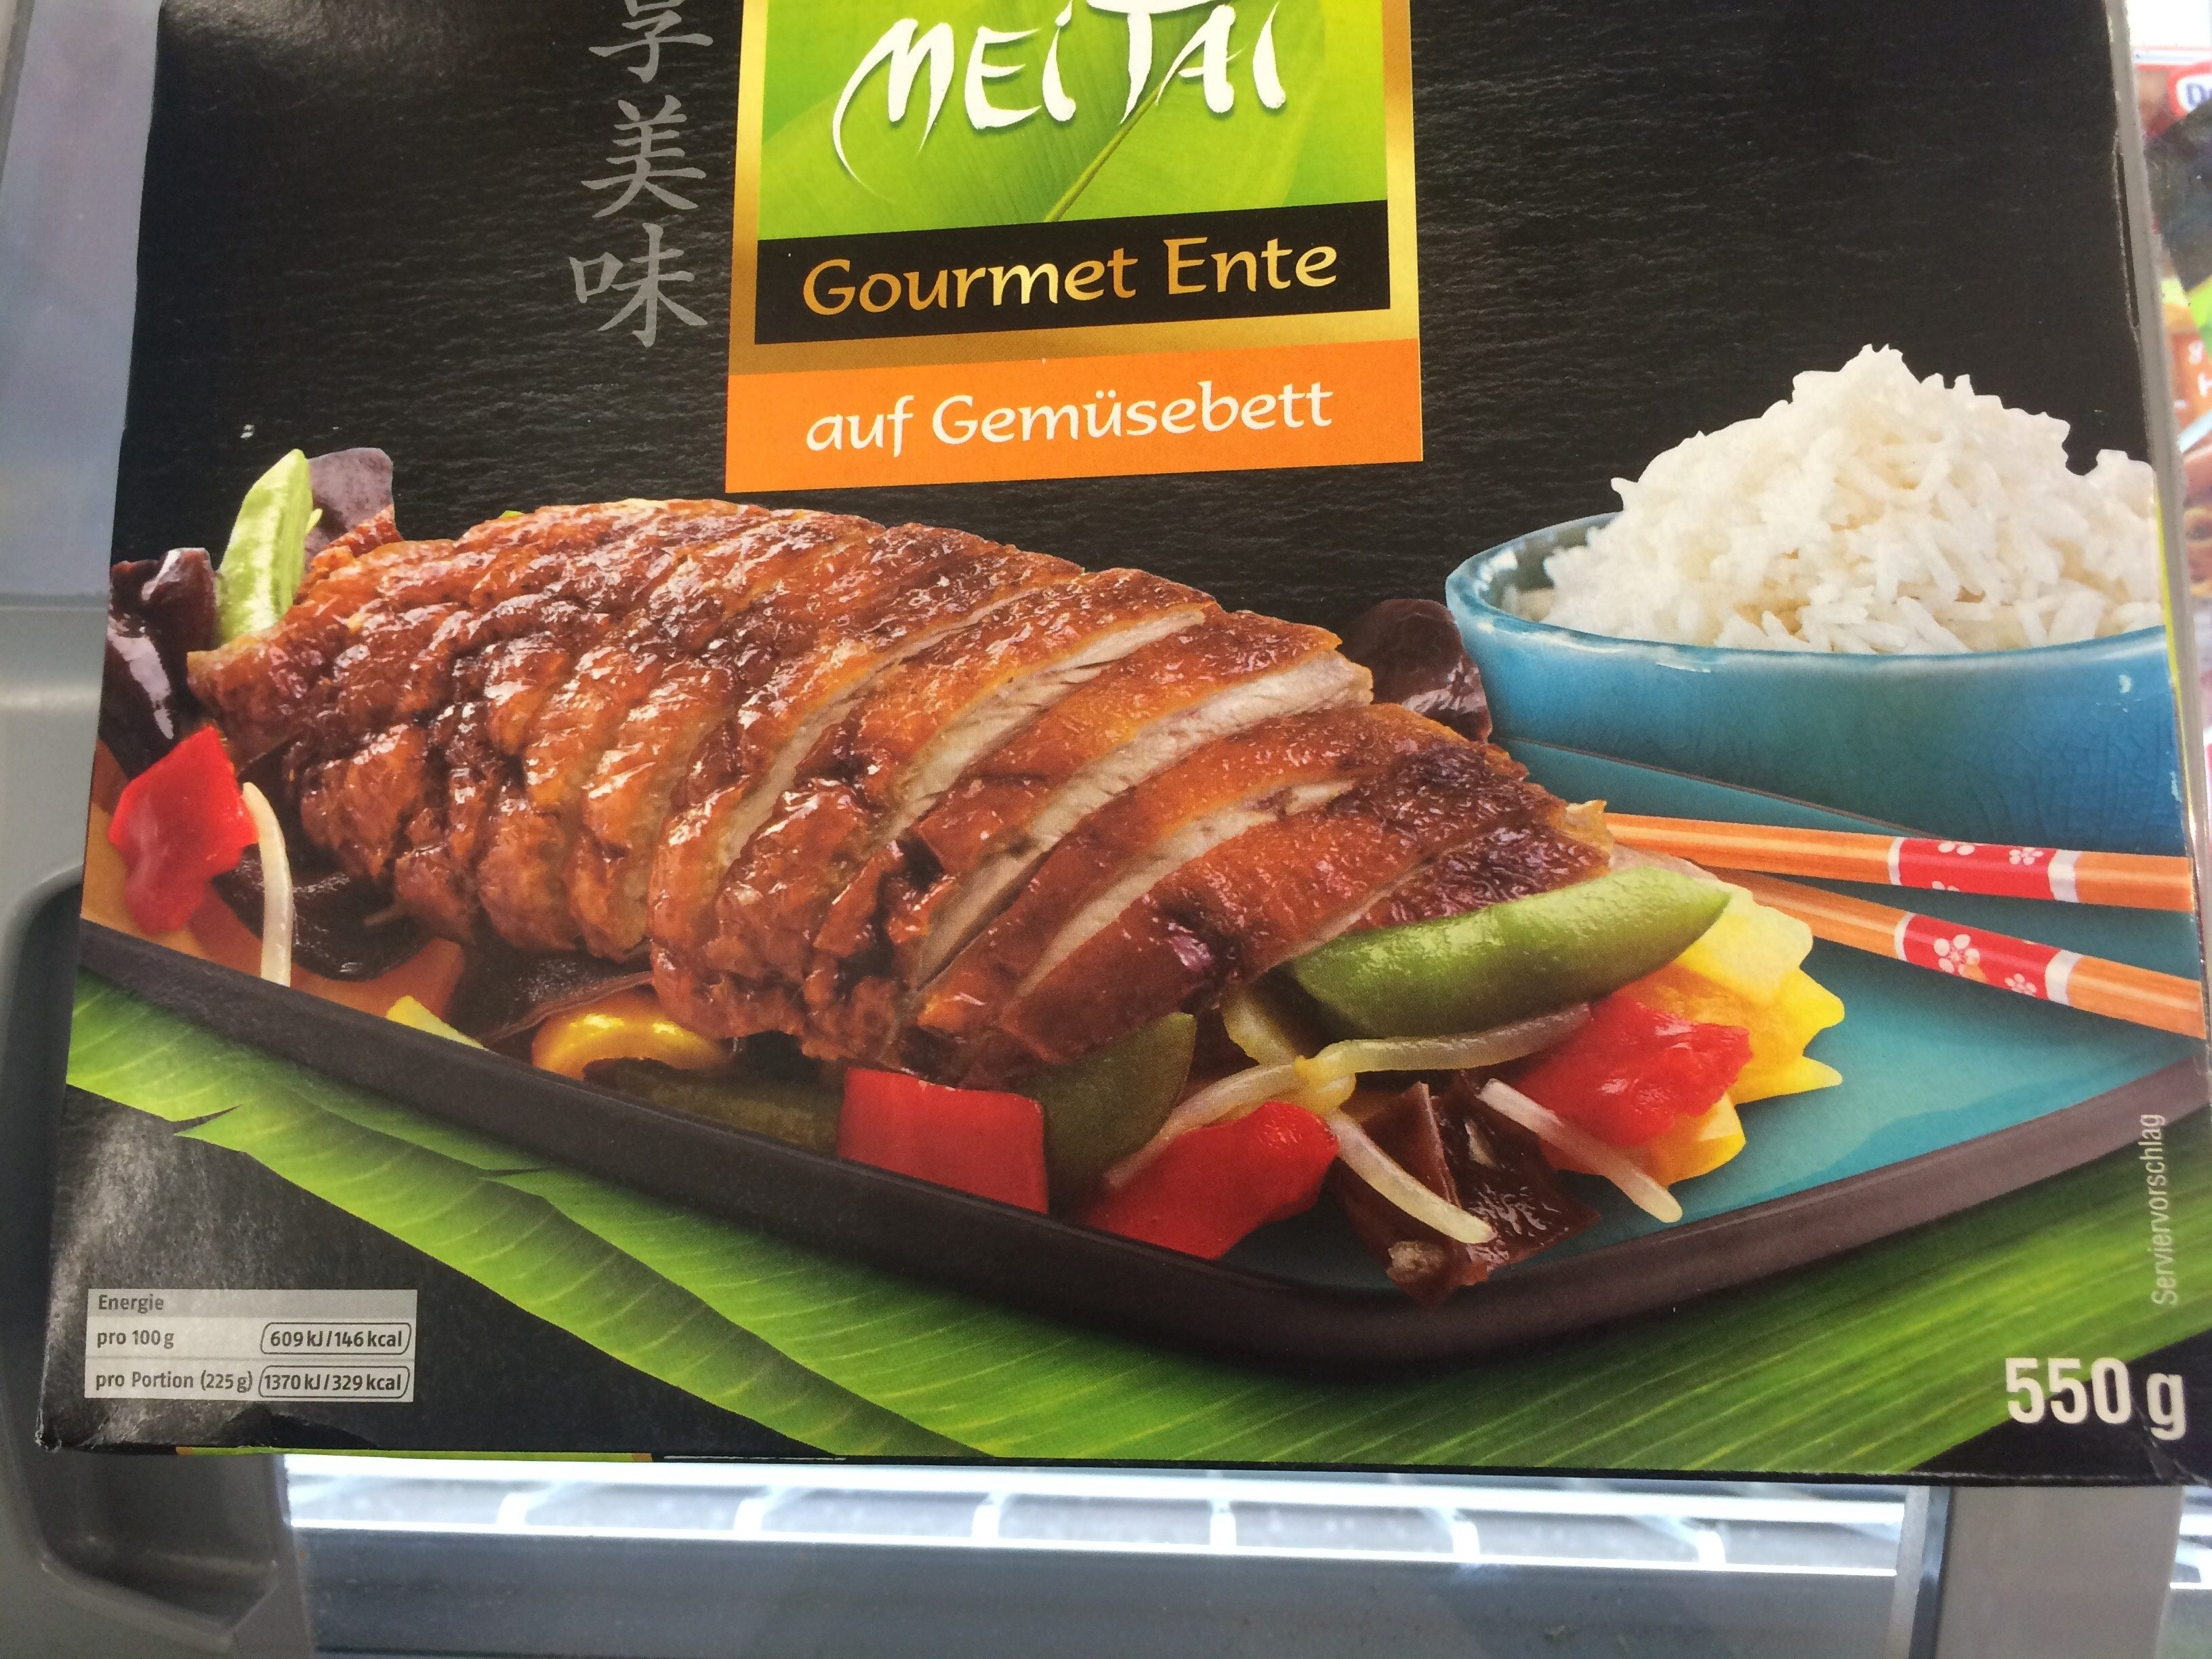 Gourmet Ente auf Gemüsebett - Product - de